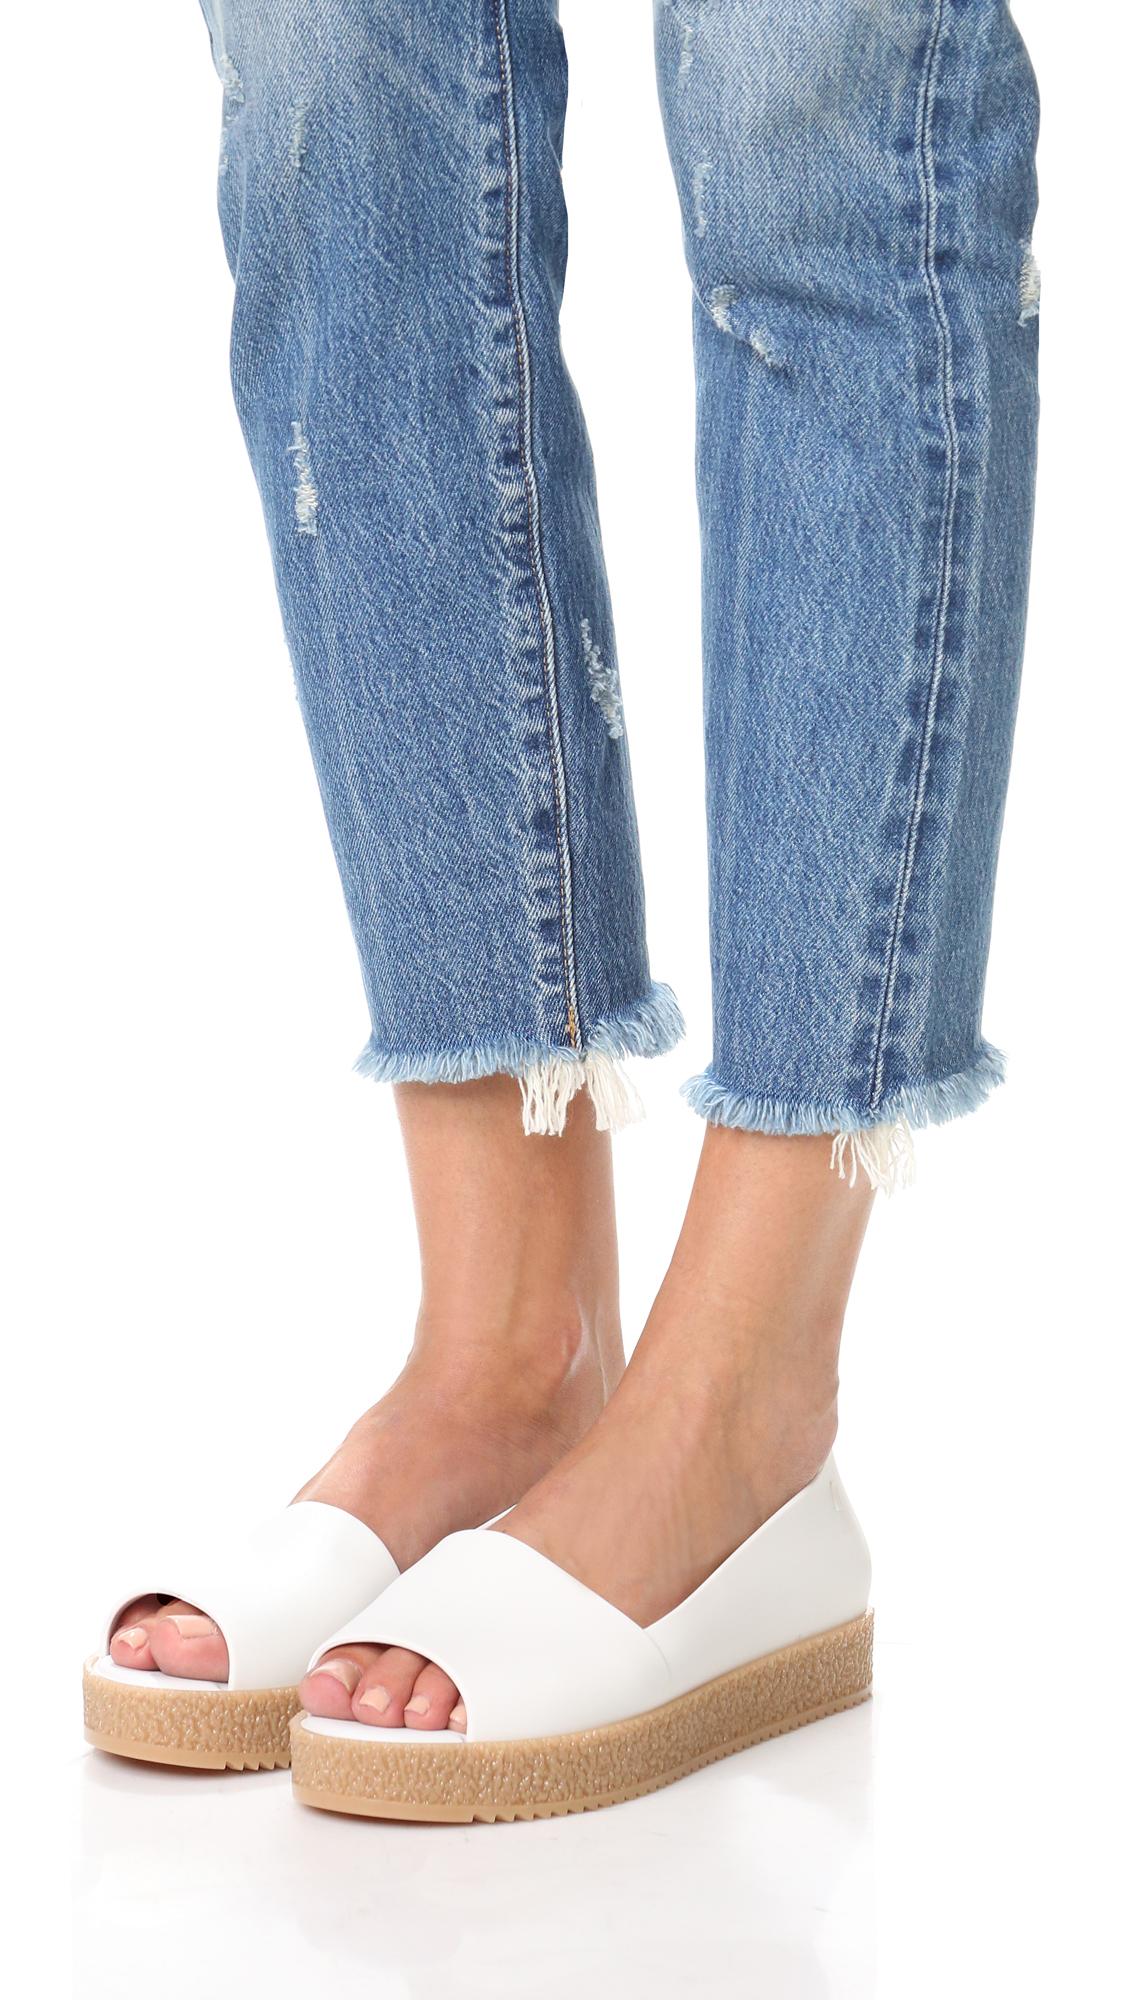 dd970cf09369 Melissa Puzzle Peep Toe Flats